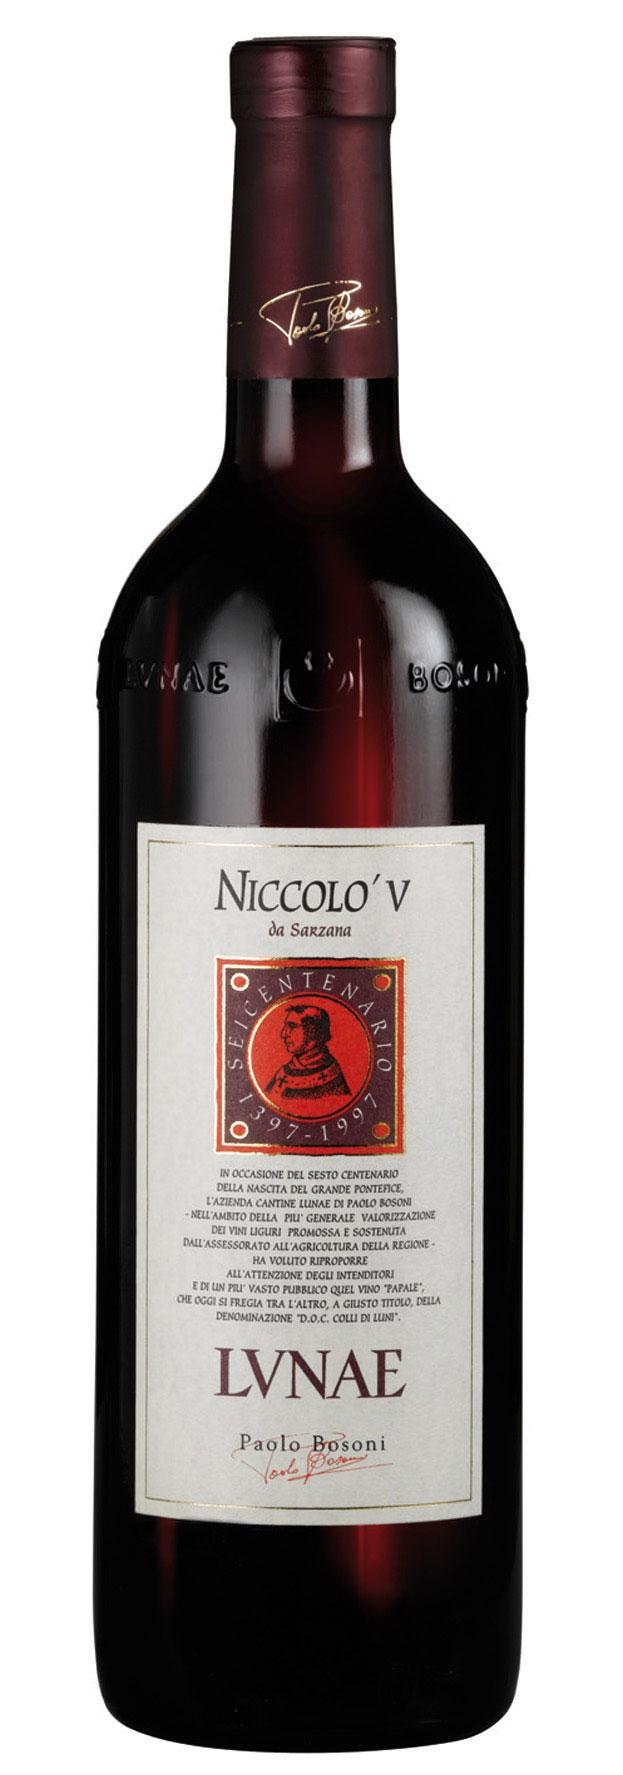 Lunae Niccolo V 2013